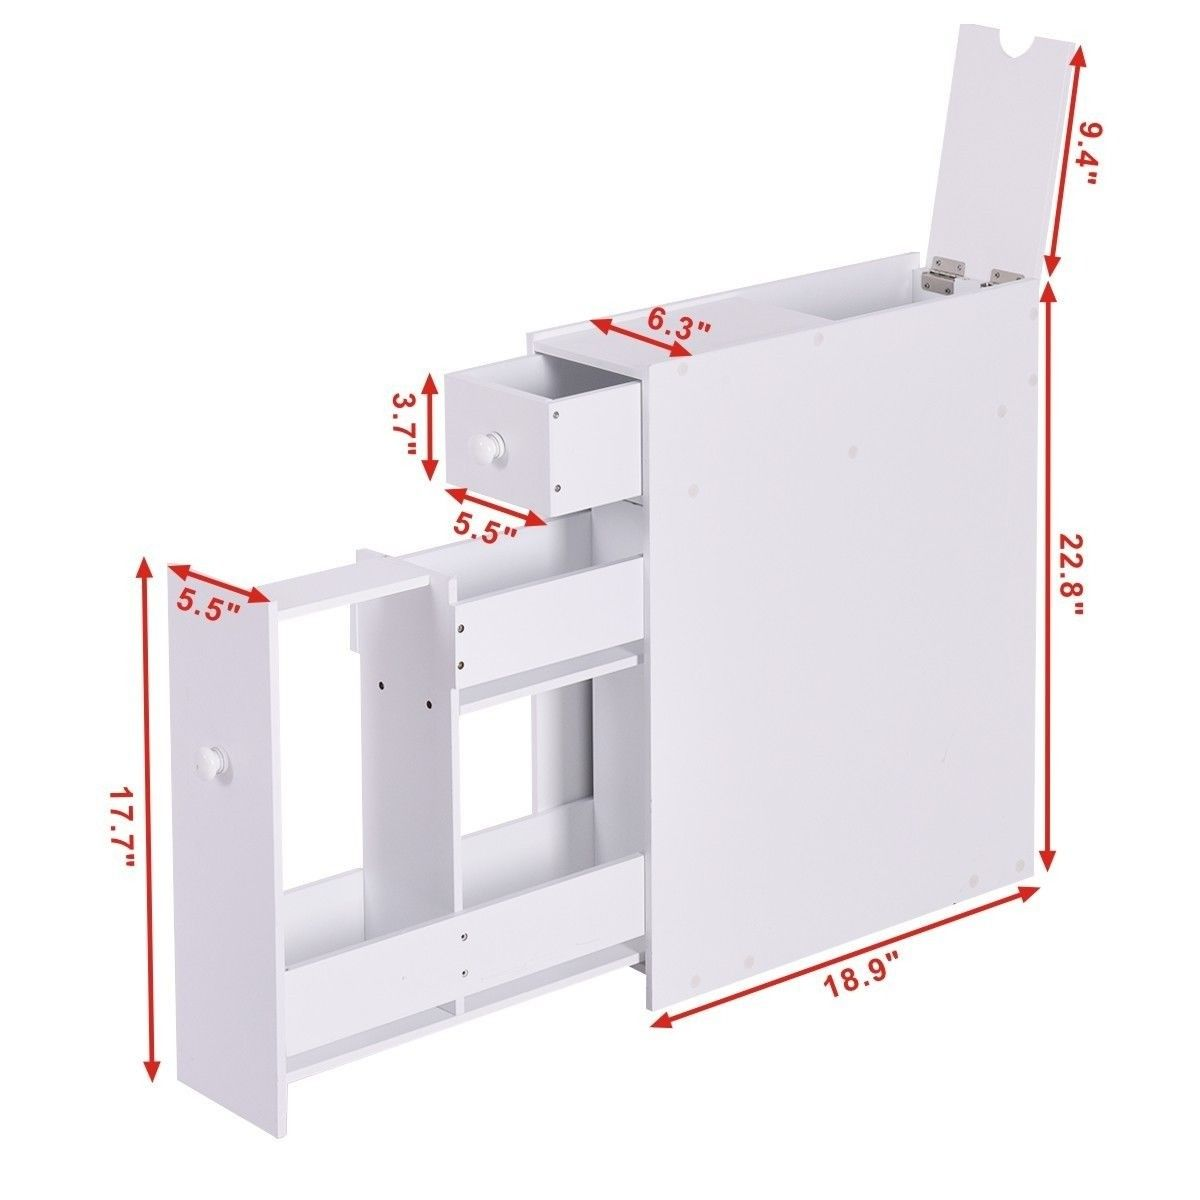 Bathroom Cabinet Space Saver Storage Organizer Wood Floor Bathroom Bathroom Storage Cabinet Diy Bathroom Storage